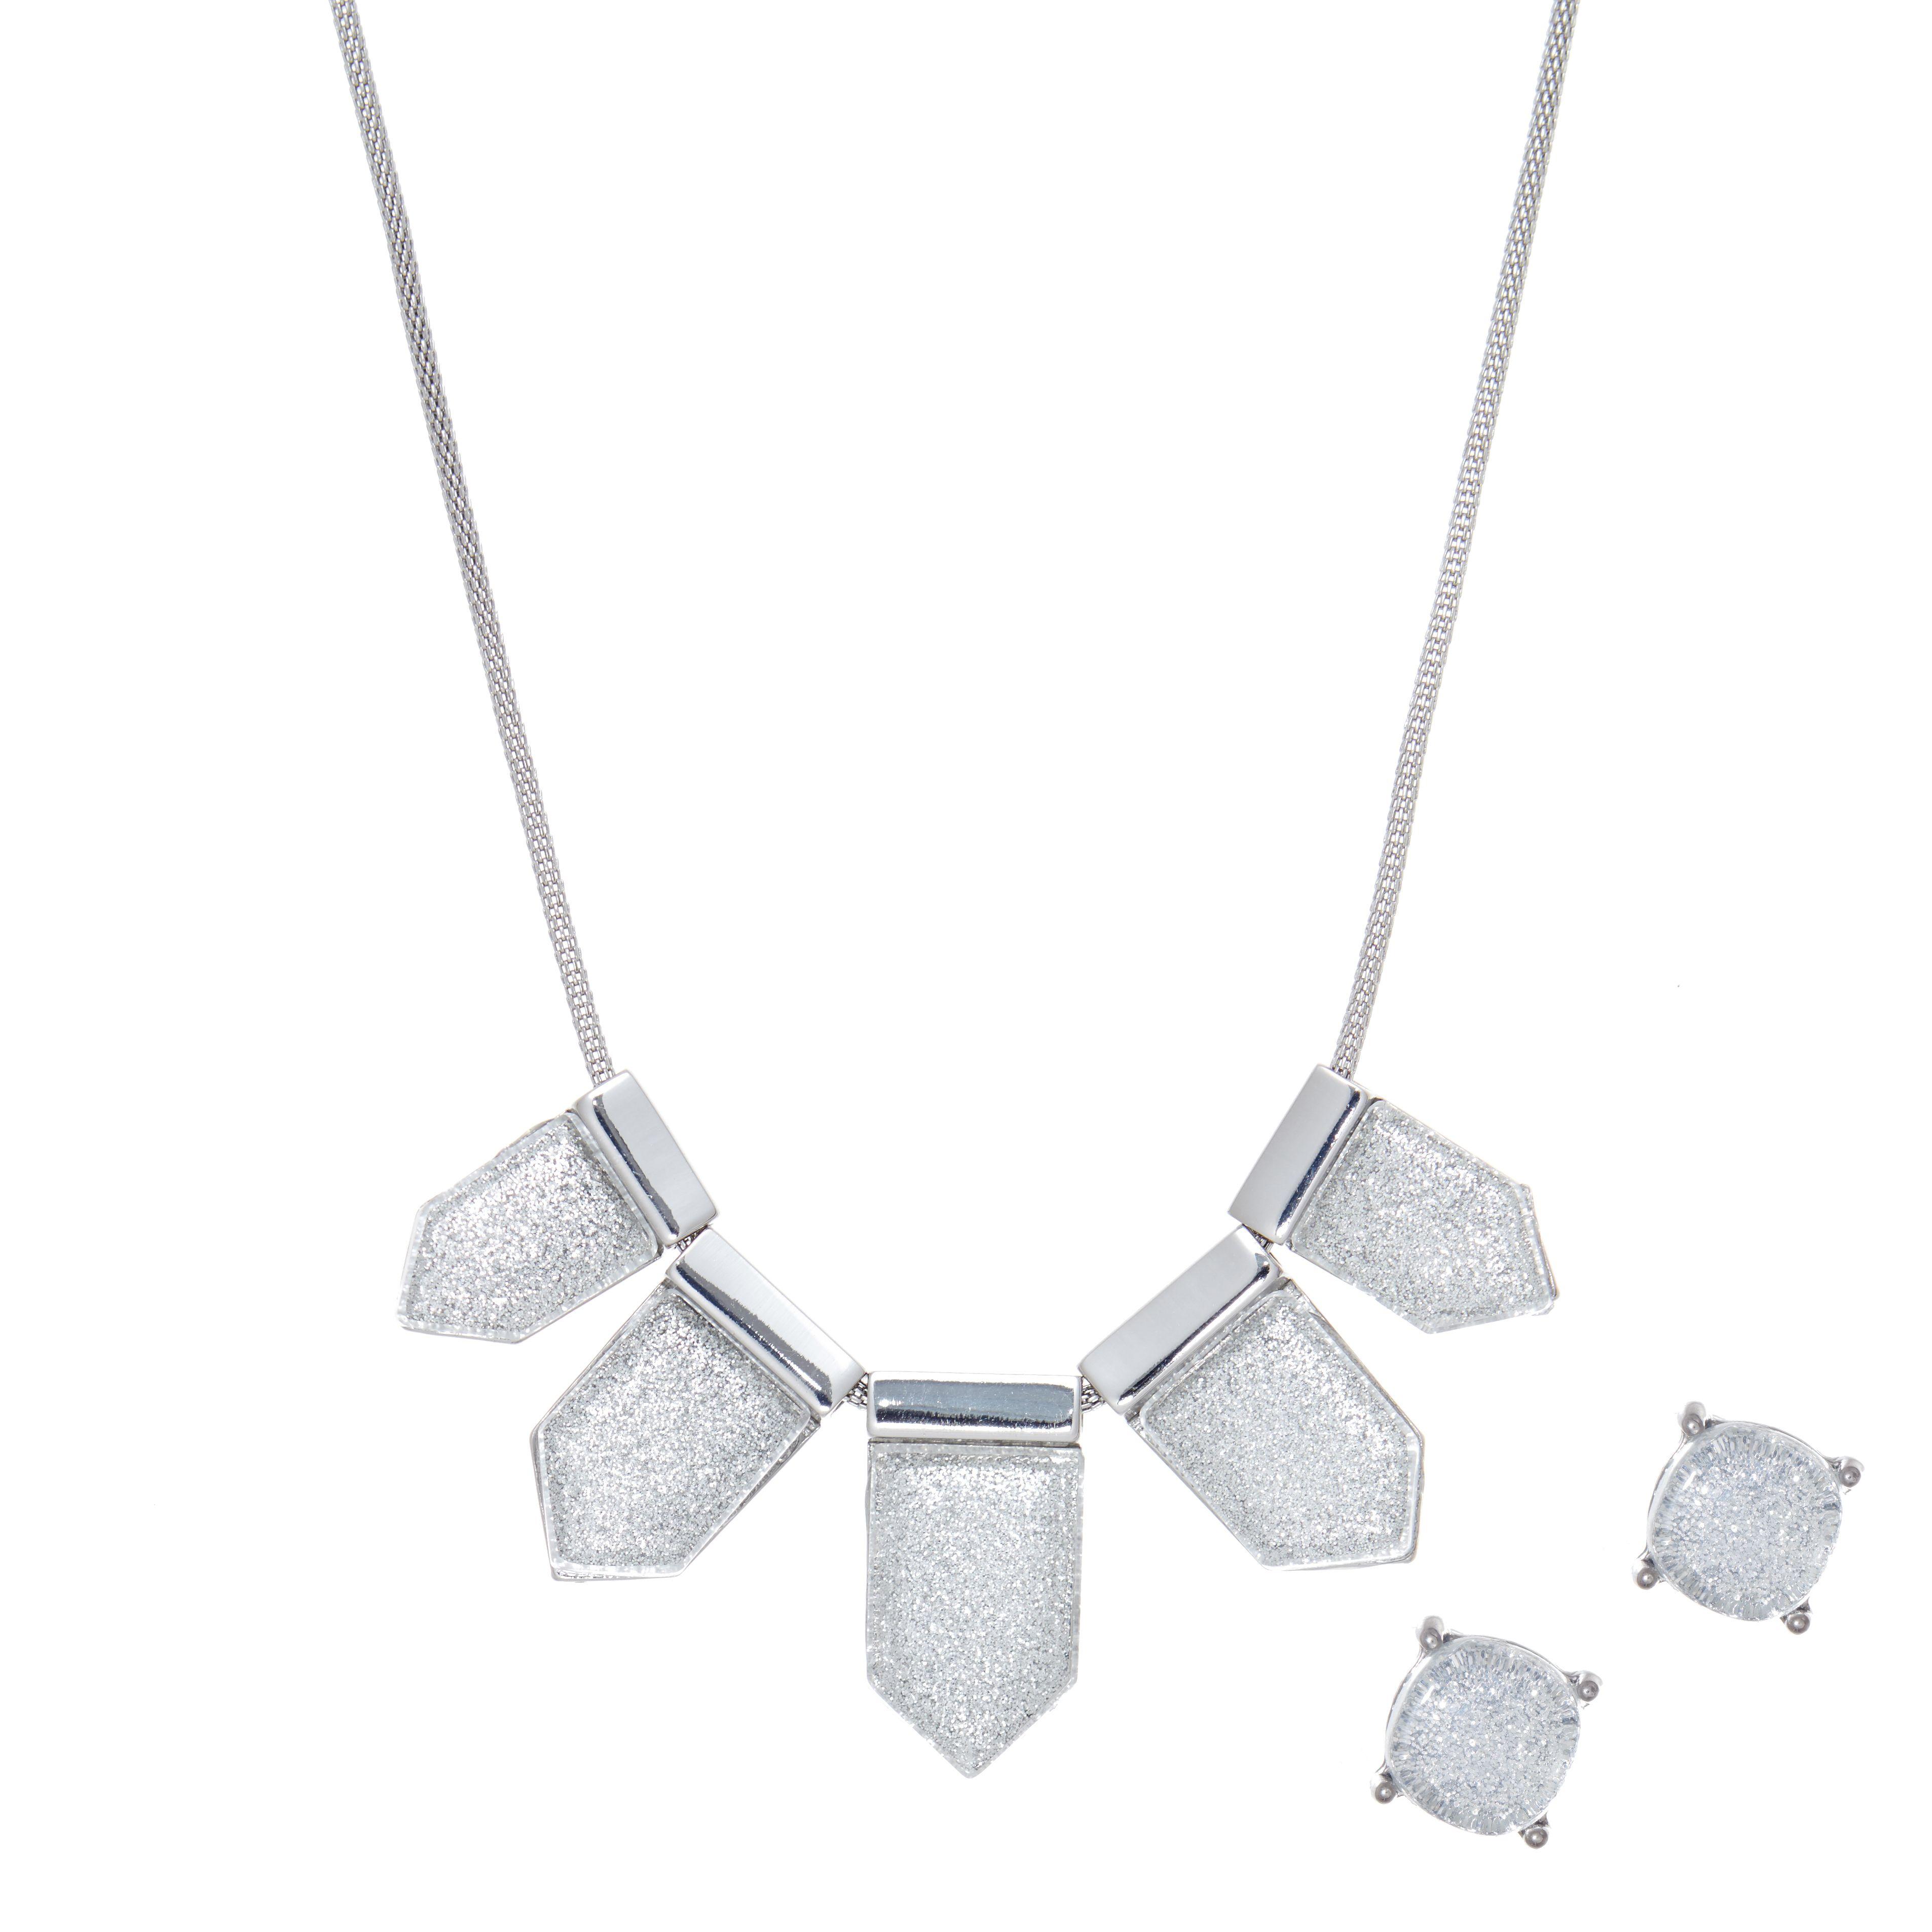 Qt Necklace & Earring Set #TraciLynnJewelry   Traci lynn ...